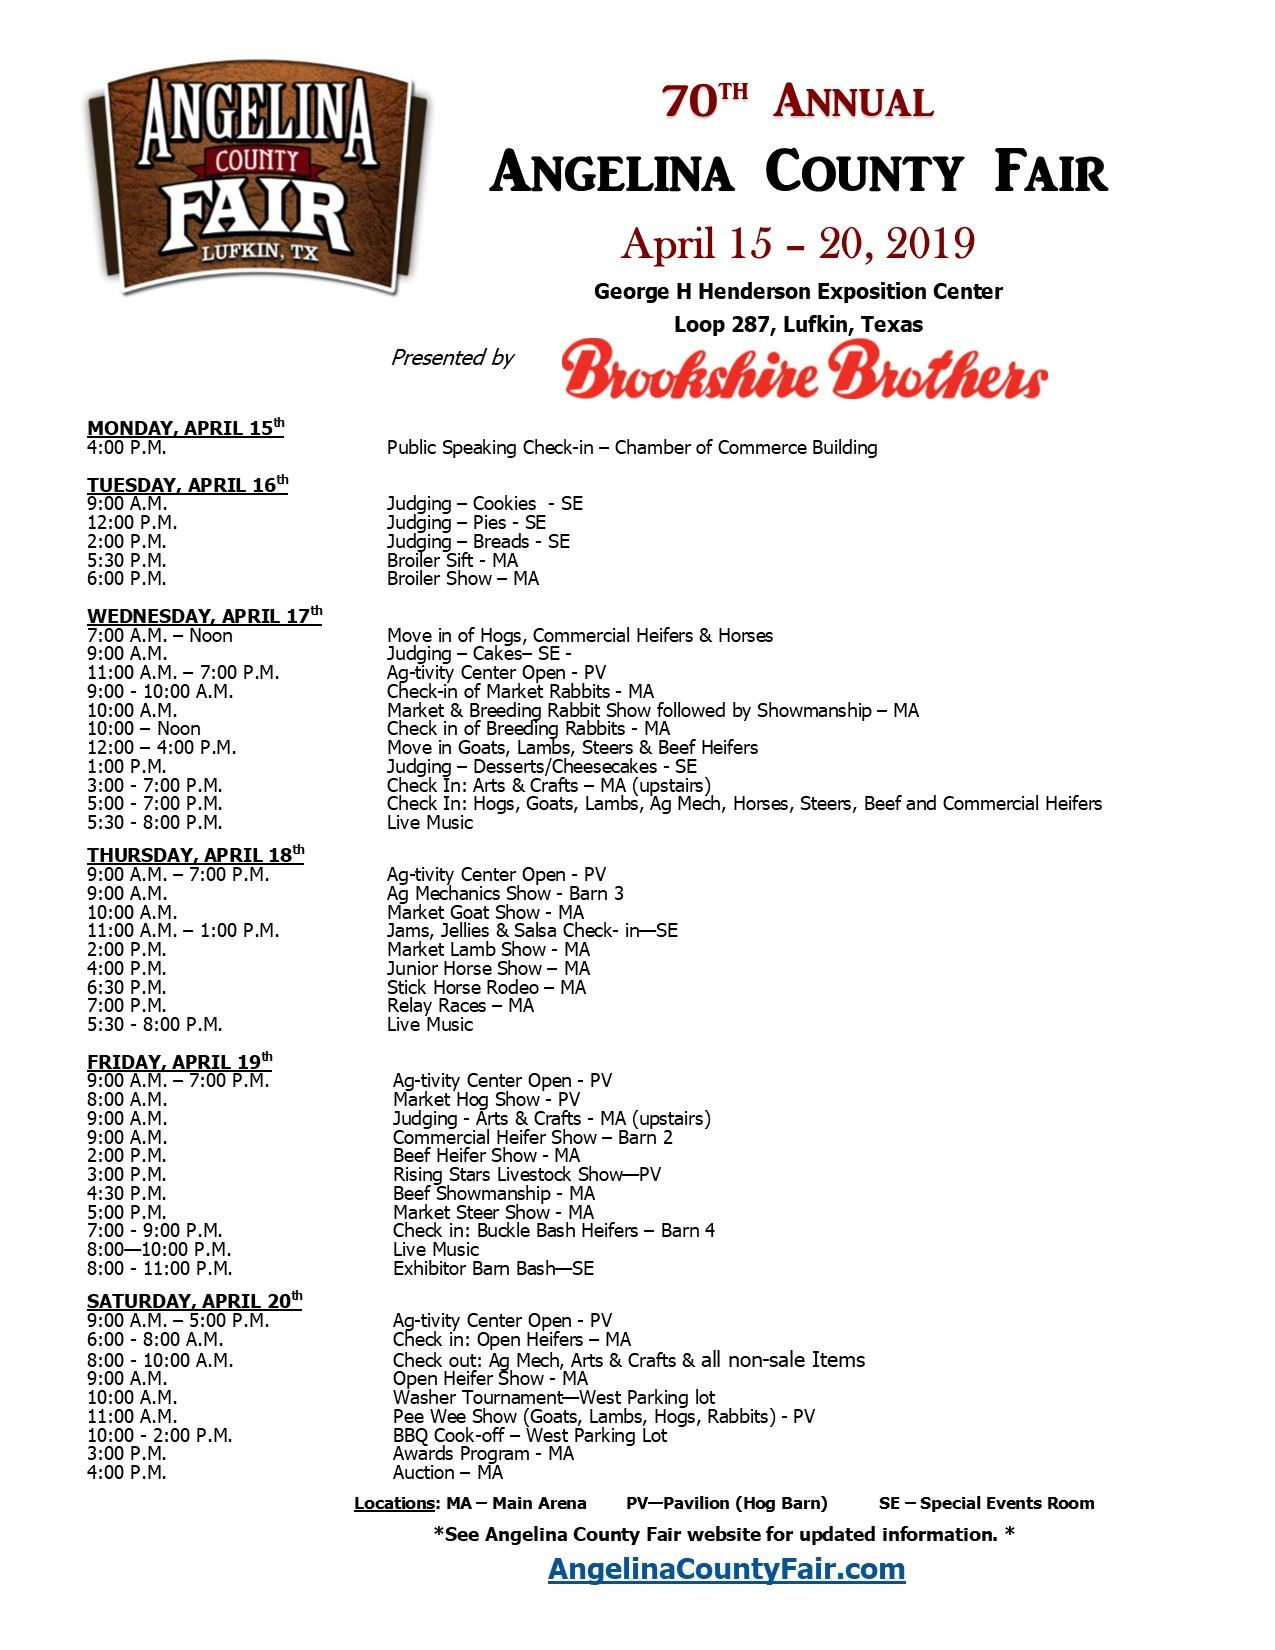 Angelina County Fair & Schedule